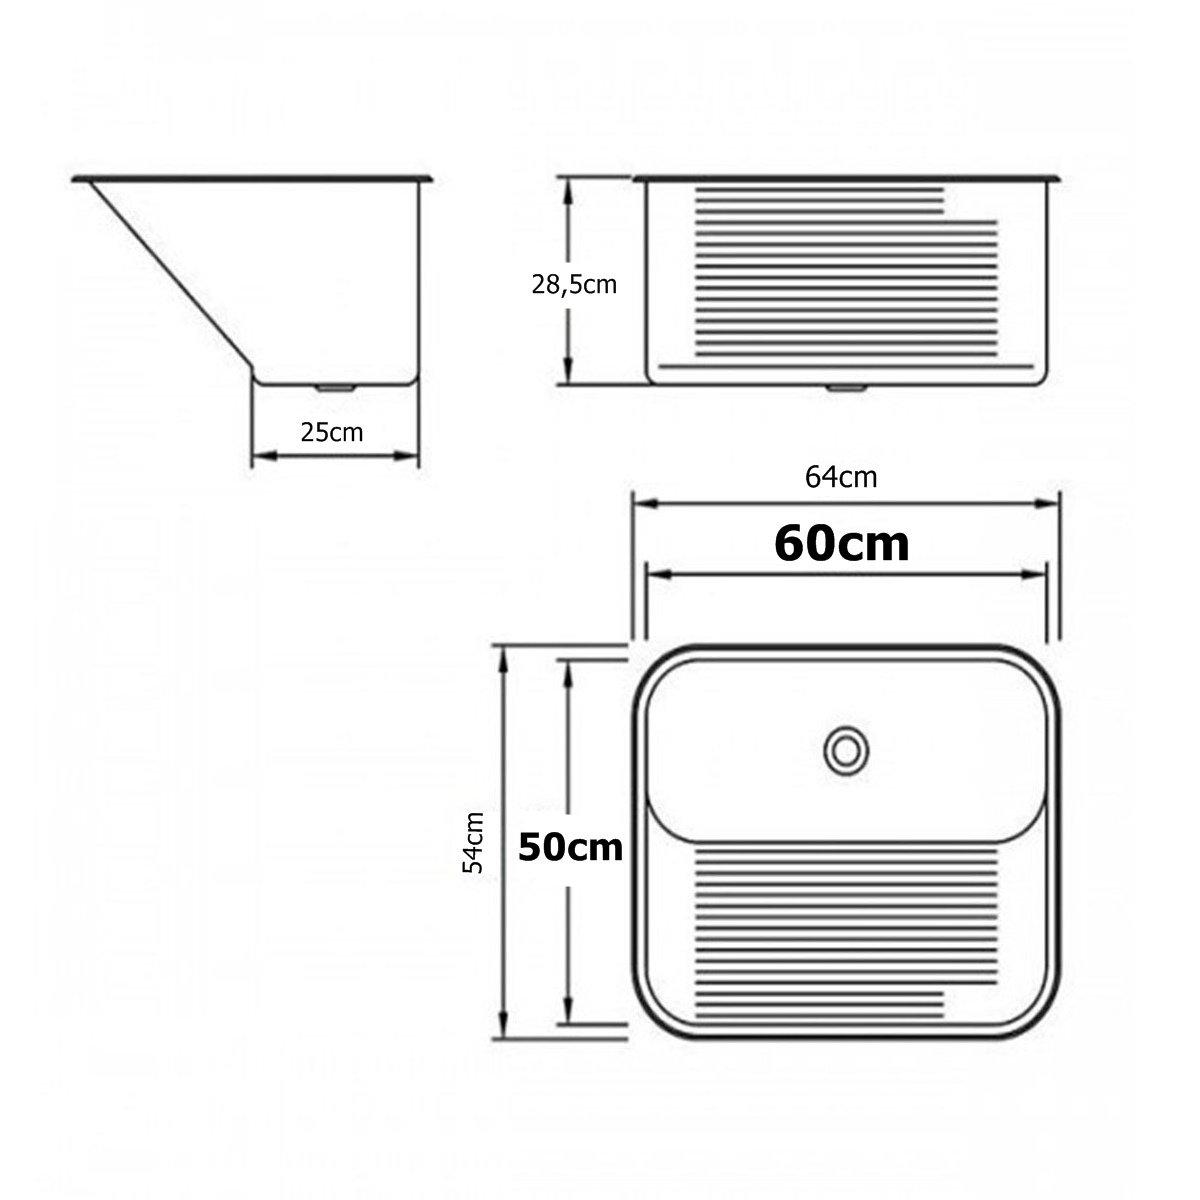 Tanque Inox Mekal 60x50x28cm CT60 Capacidade 60 litros